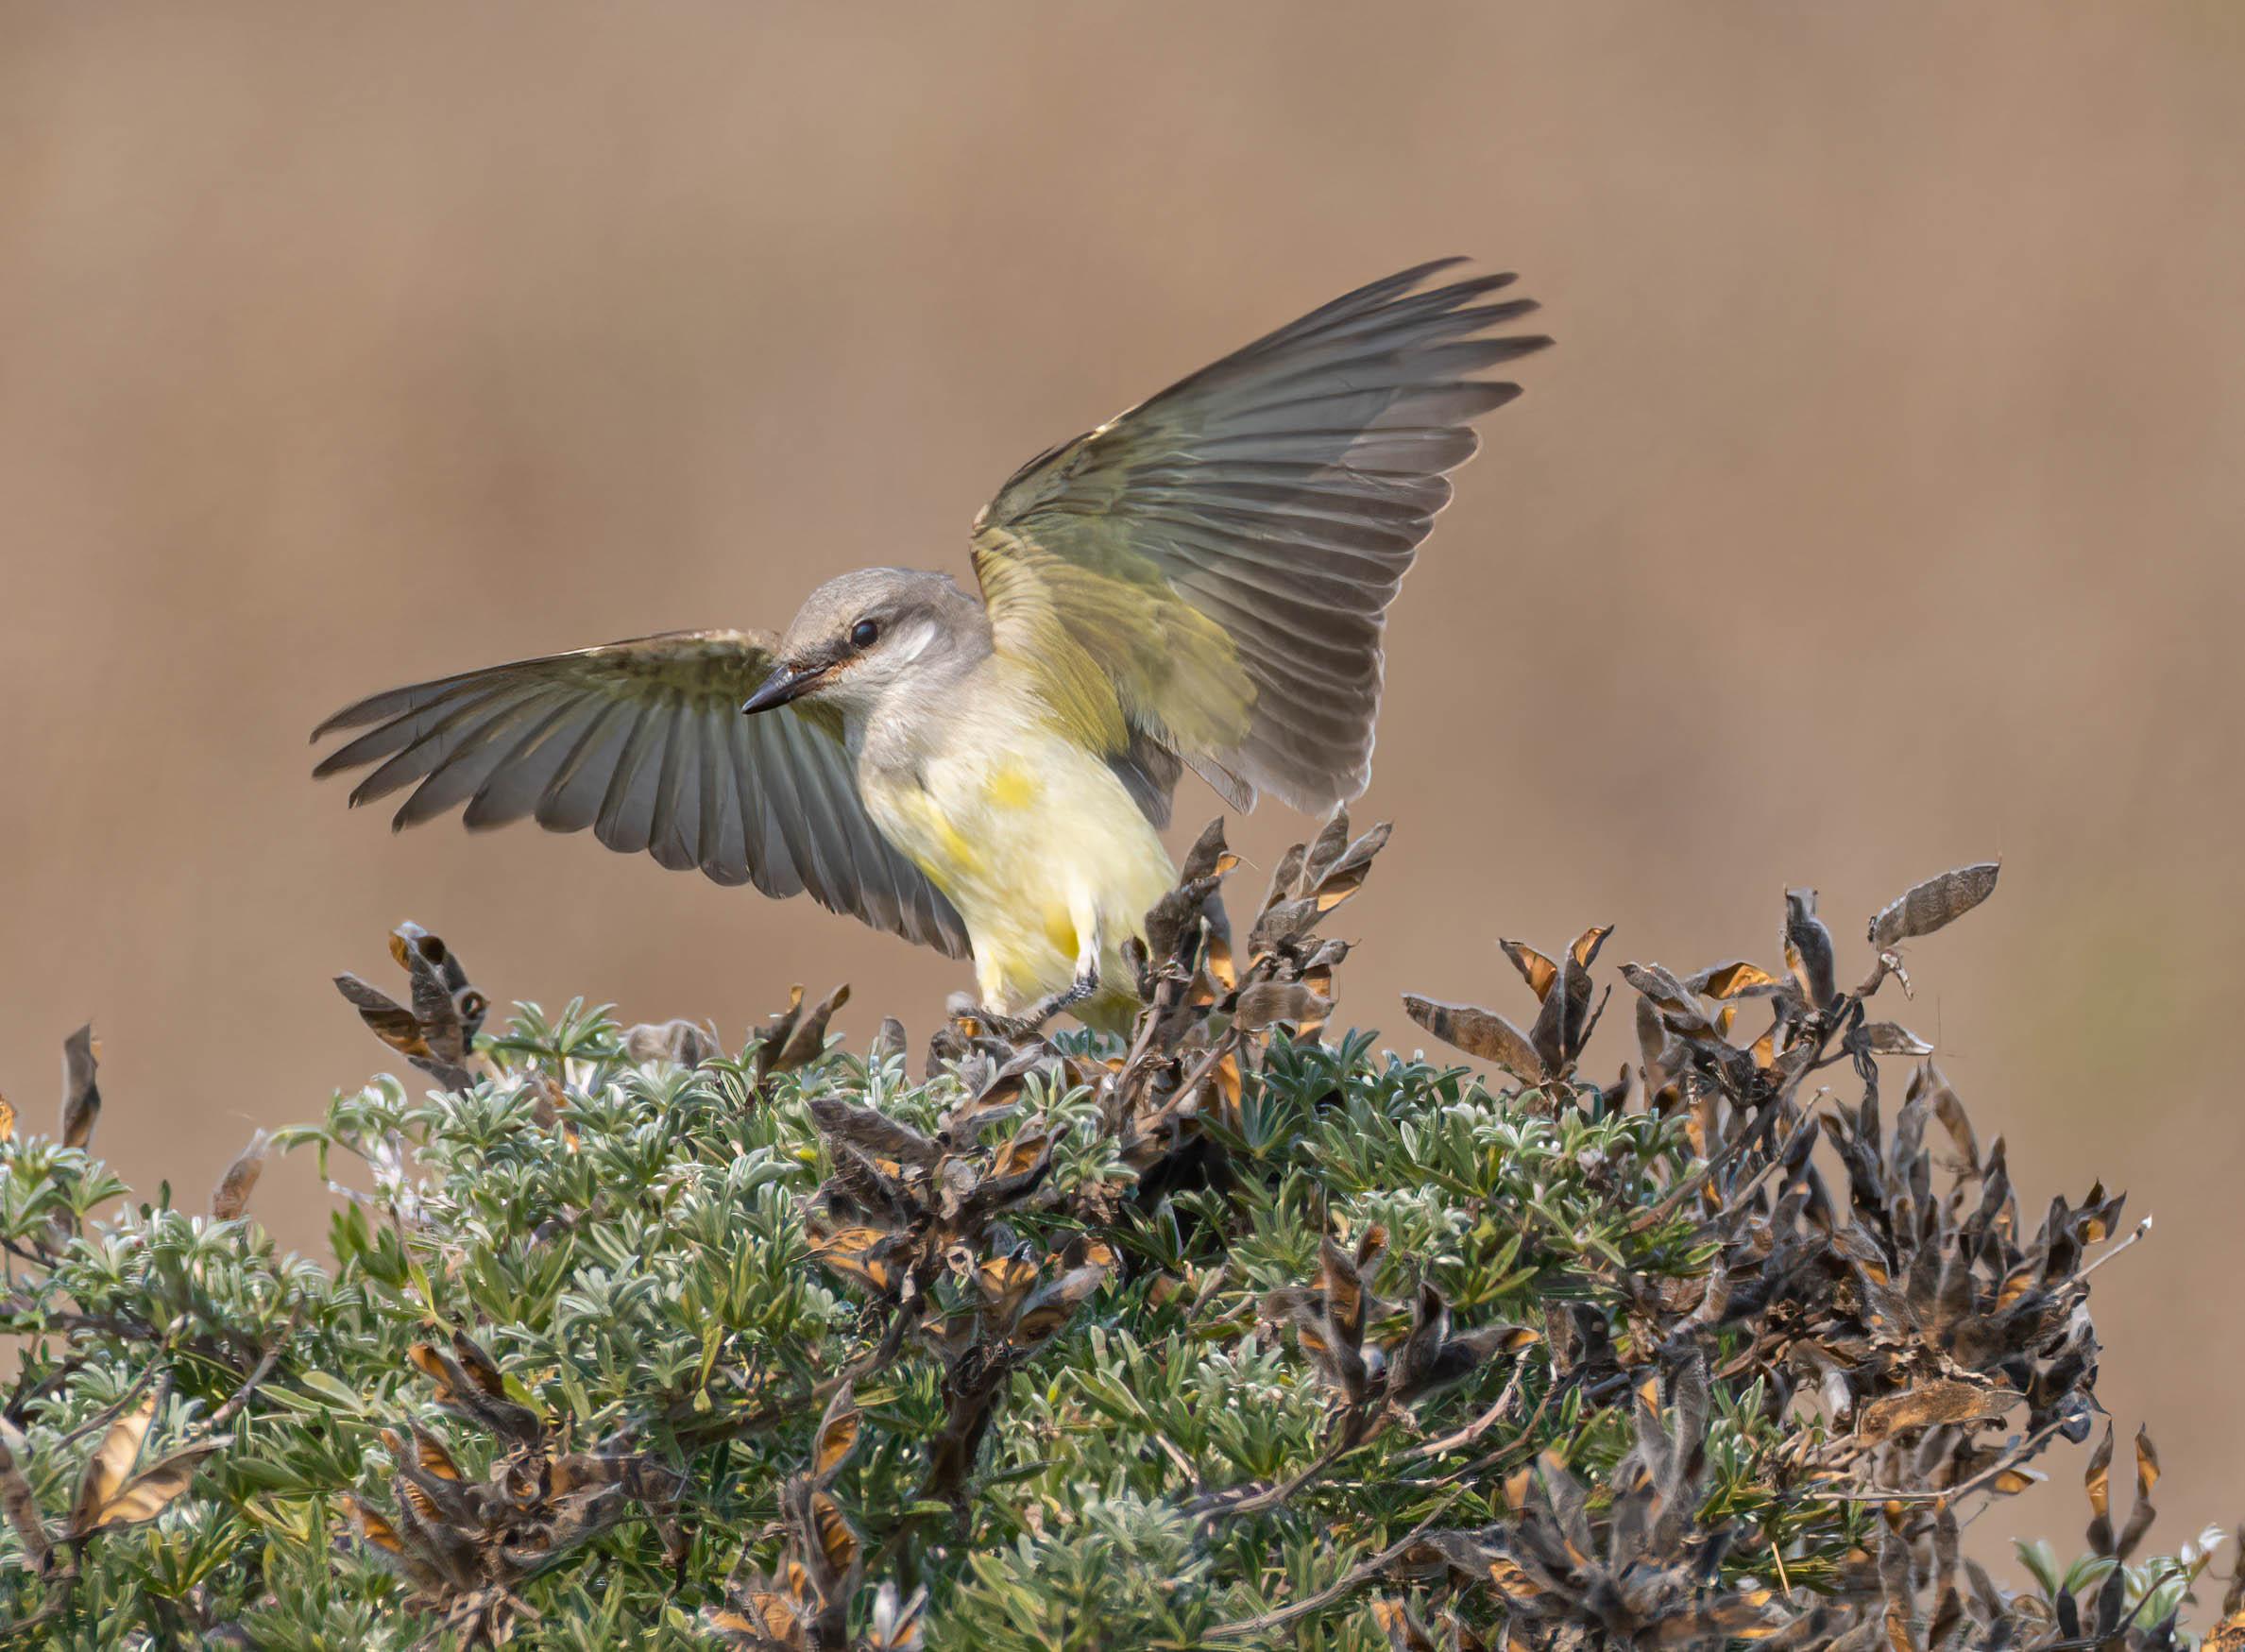 Kingbird Stretch by Mike Petrich